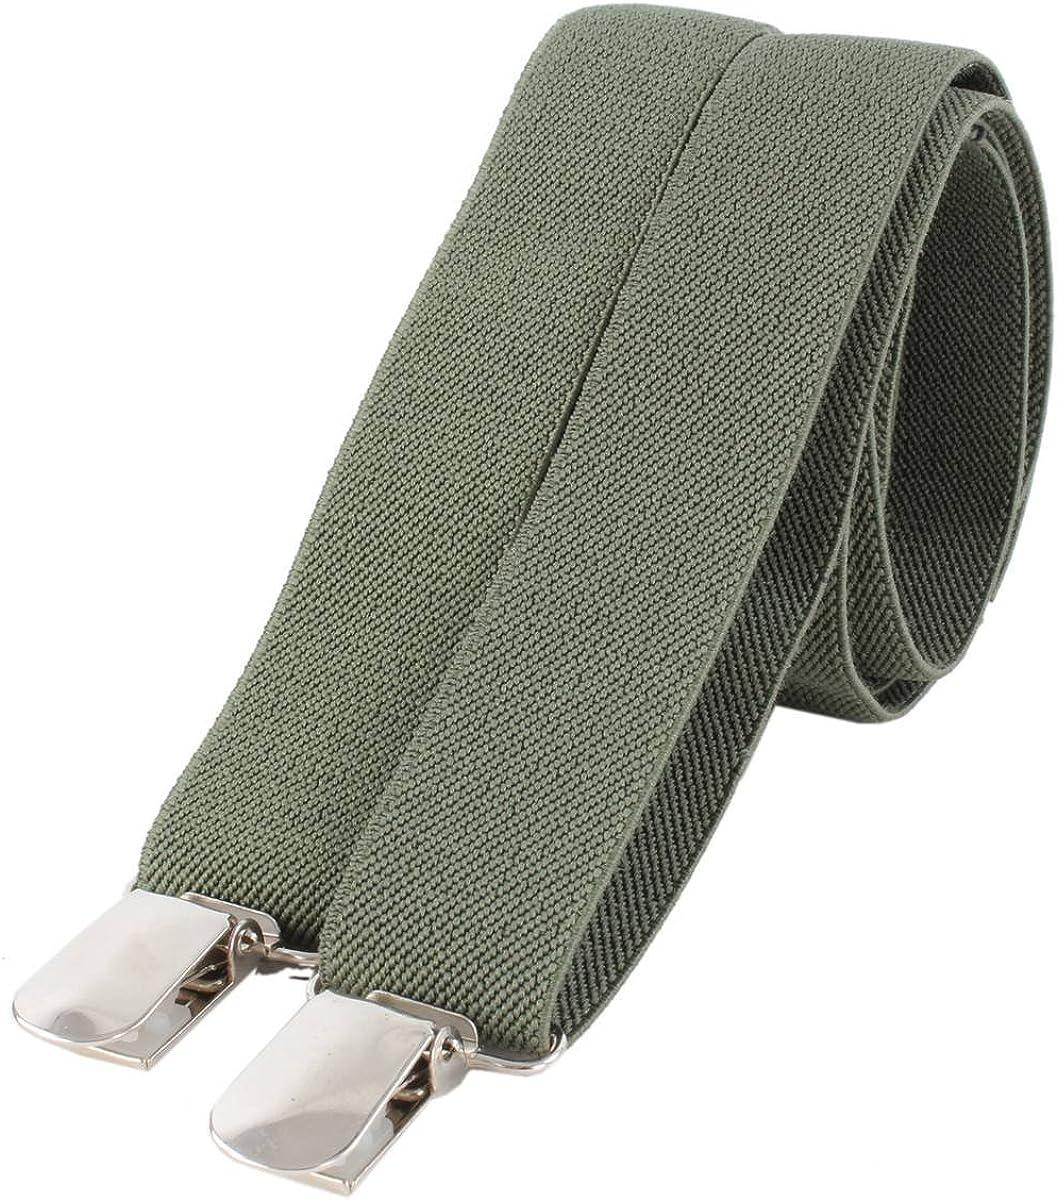 Knightsbridge Neckwear Mens Clip on Braces - Olive